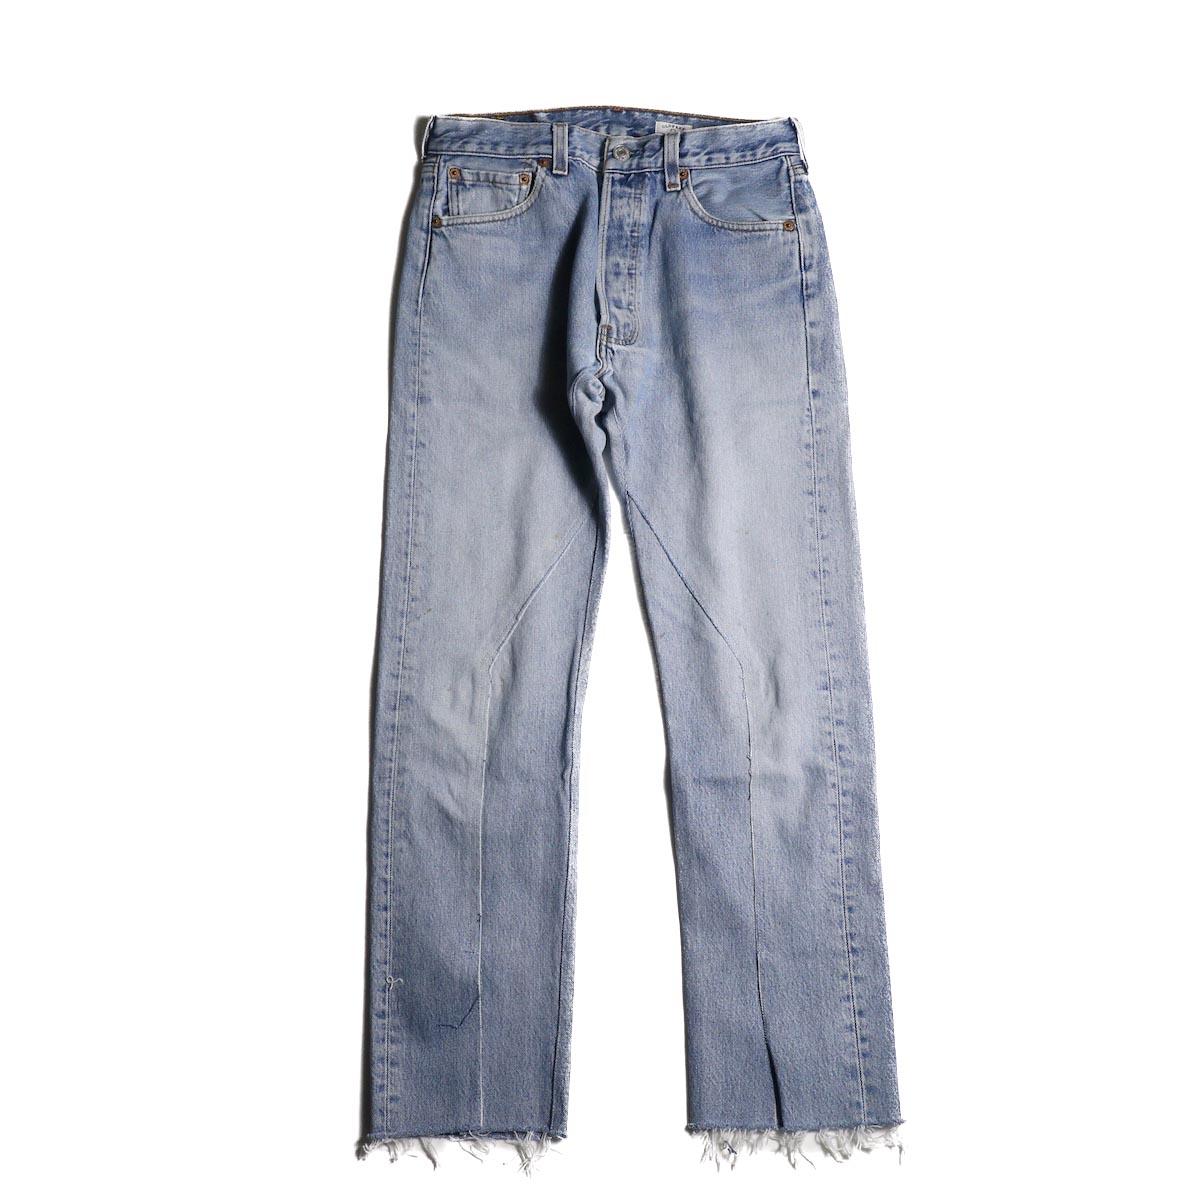 OLD PARK / Slit Jeans (Blue) (Ssize-B)